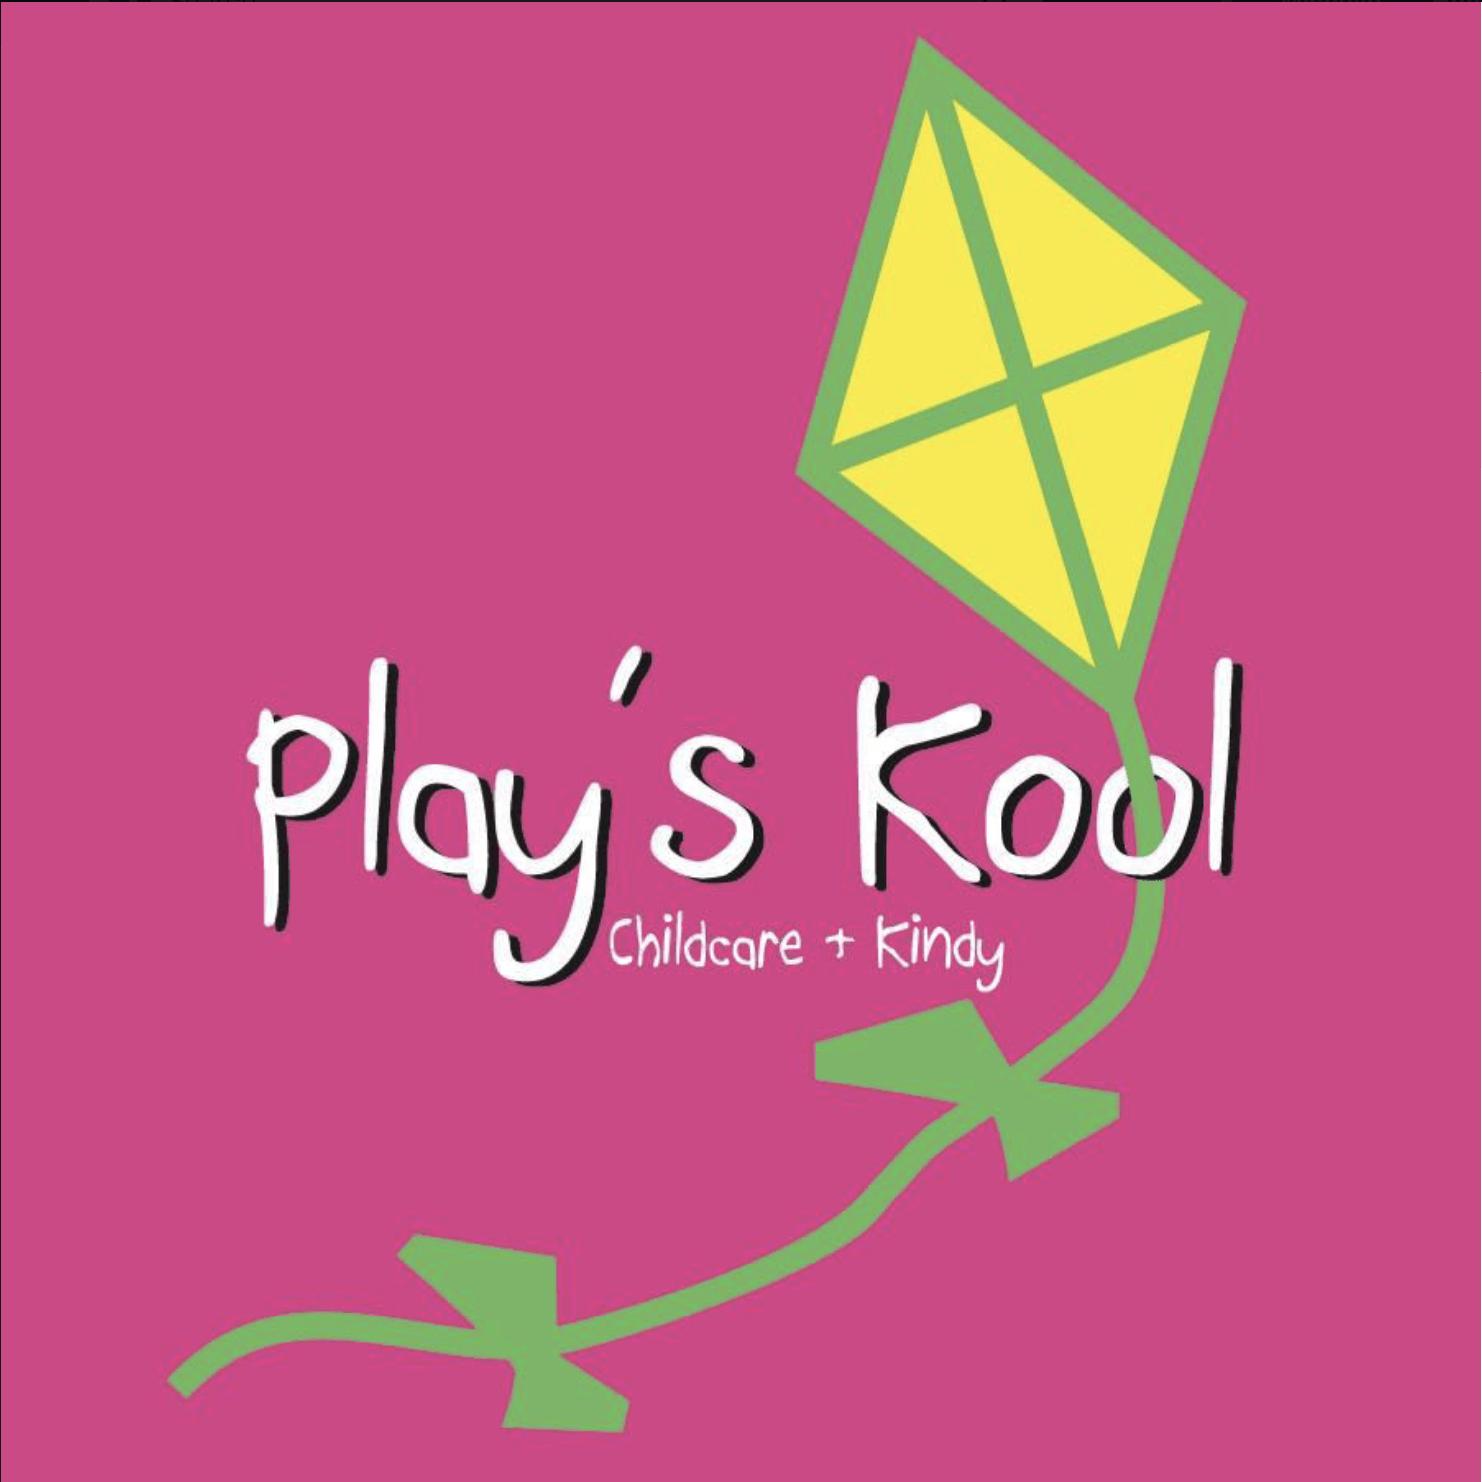 Play's Kool